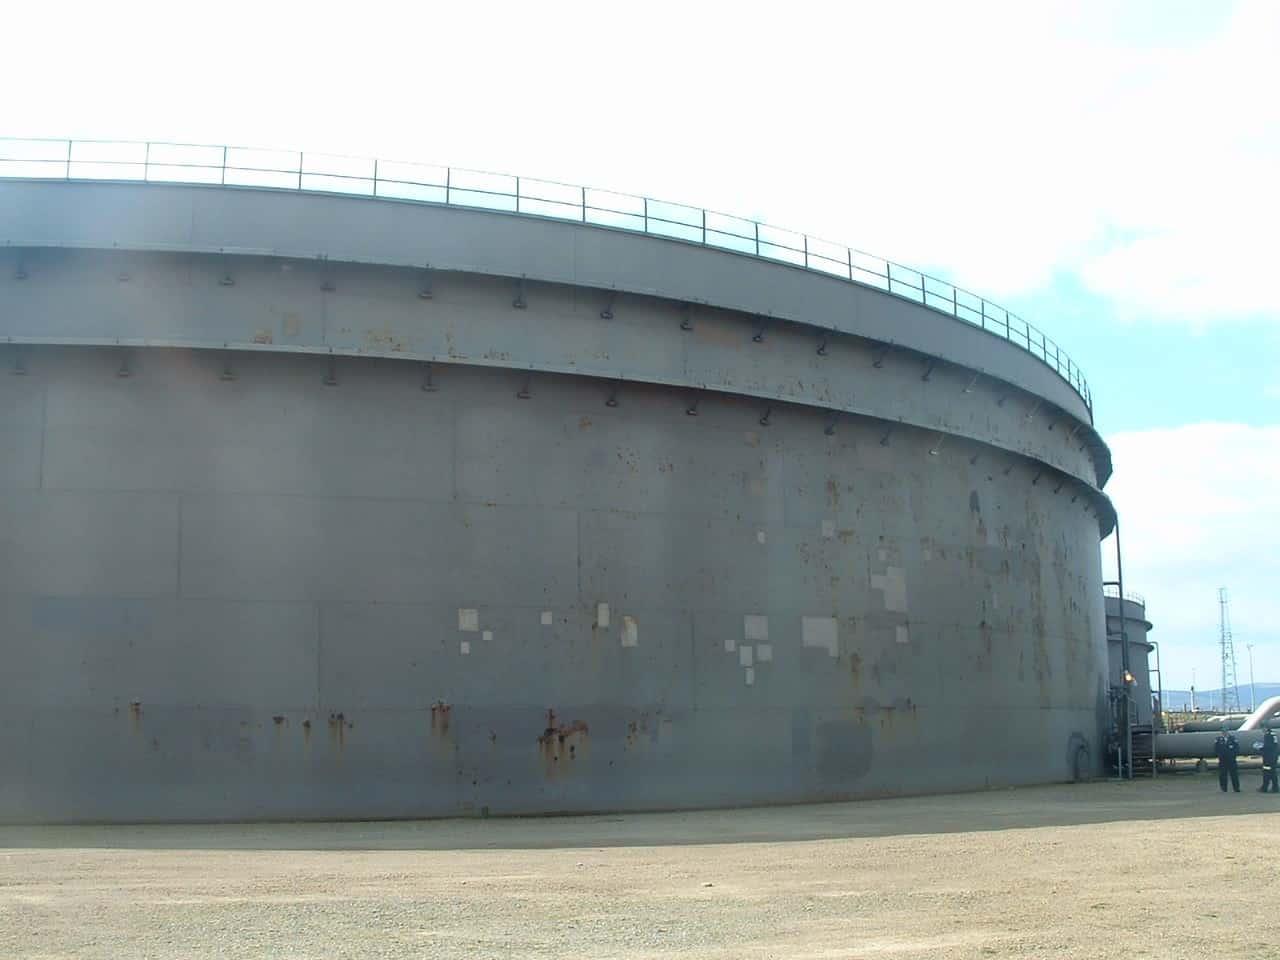 large unpainted external oil tank